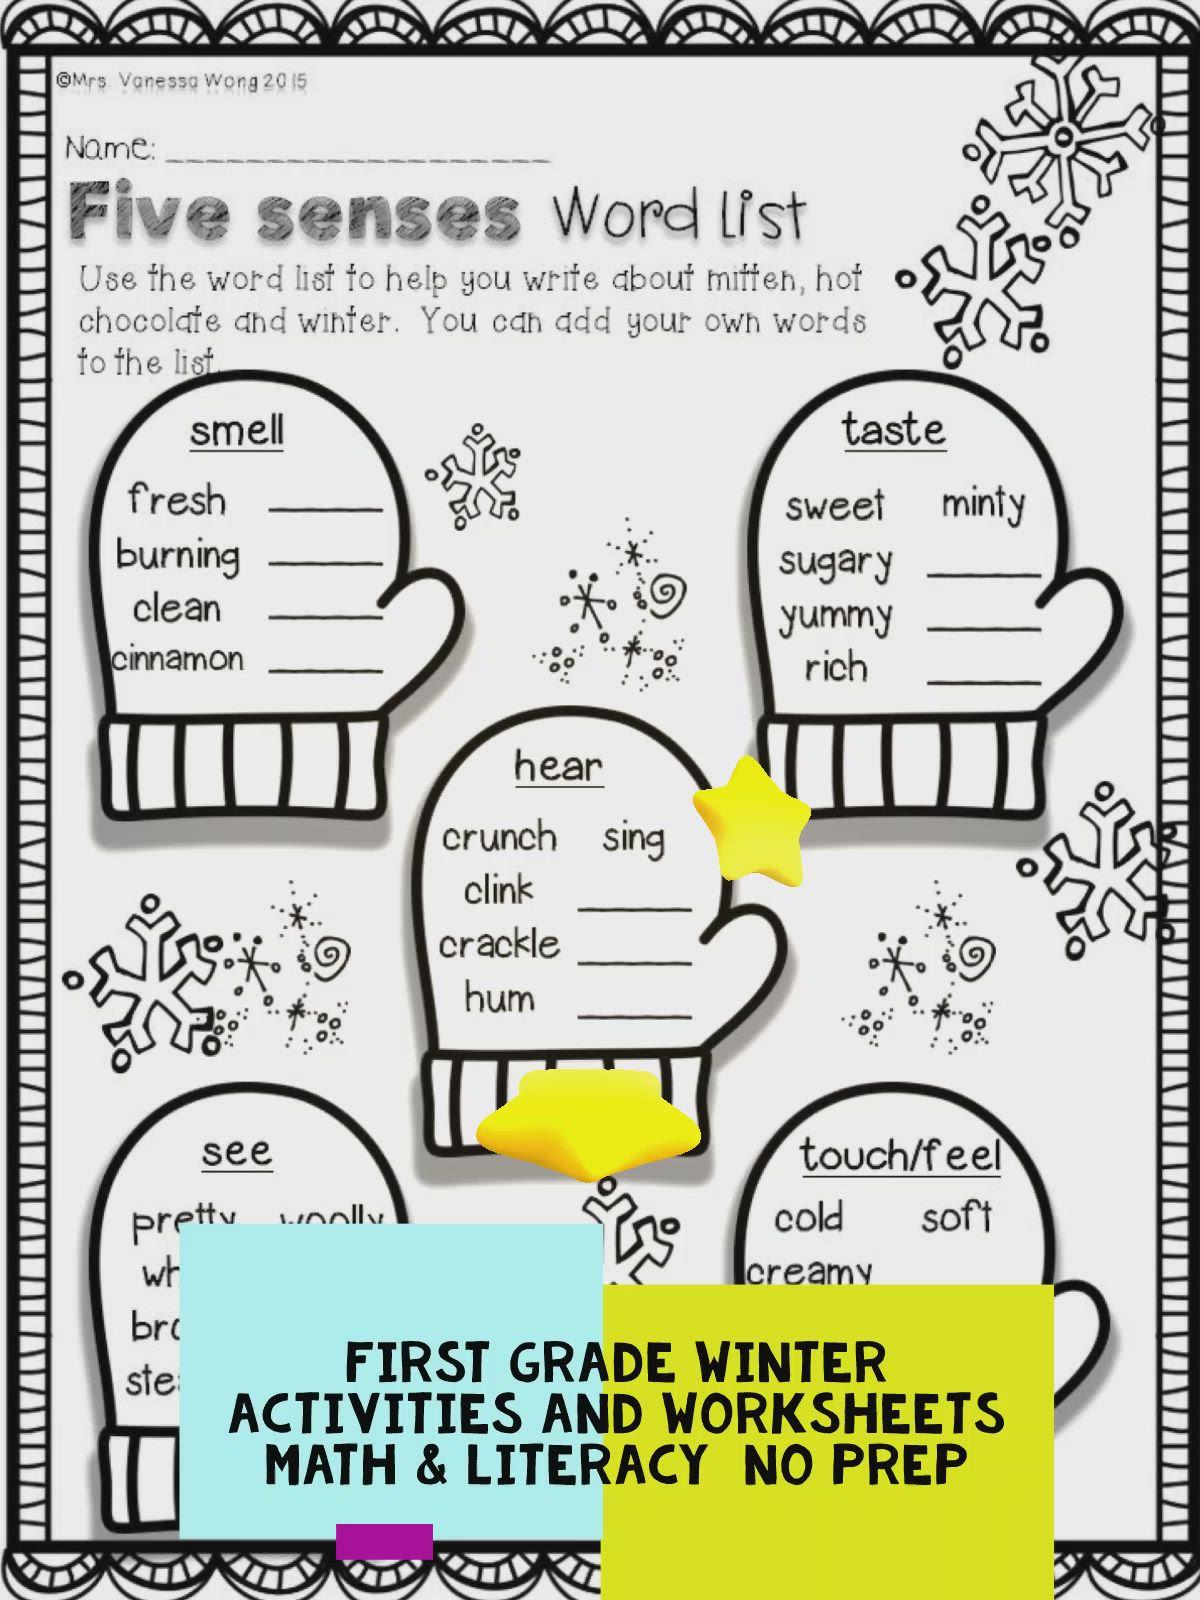 Winter Math And Literacy No Prep Printables First Grade Video Video Math Literacy Winter Math First Grade Activities [ 1600 x 1200 Pixel ]